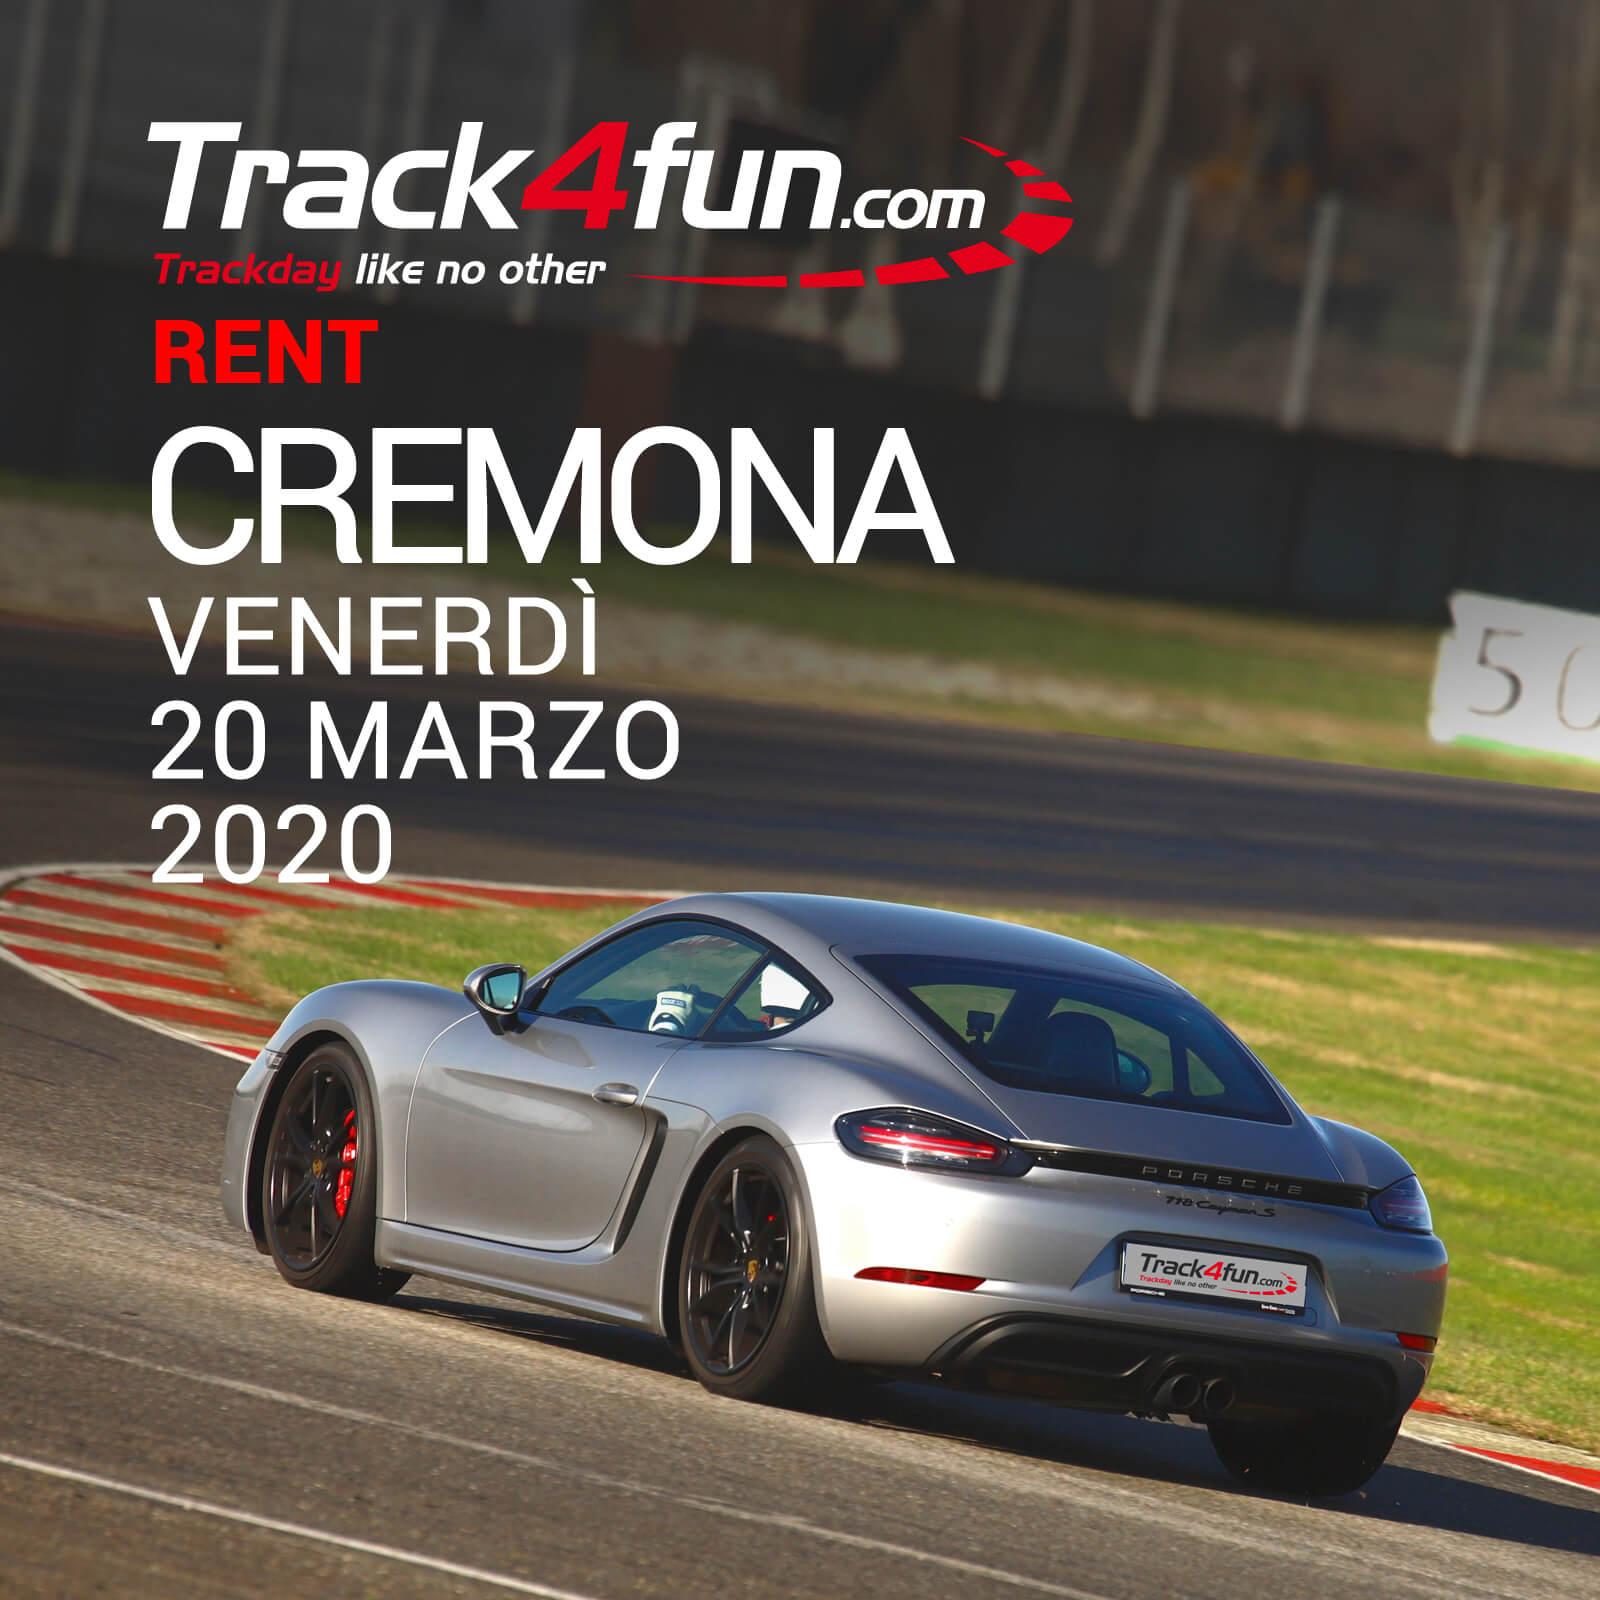 Track4fun Rent Cremona 20-03-2020